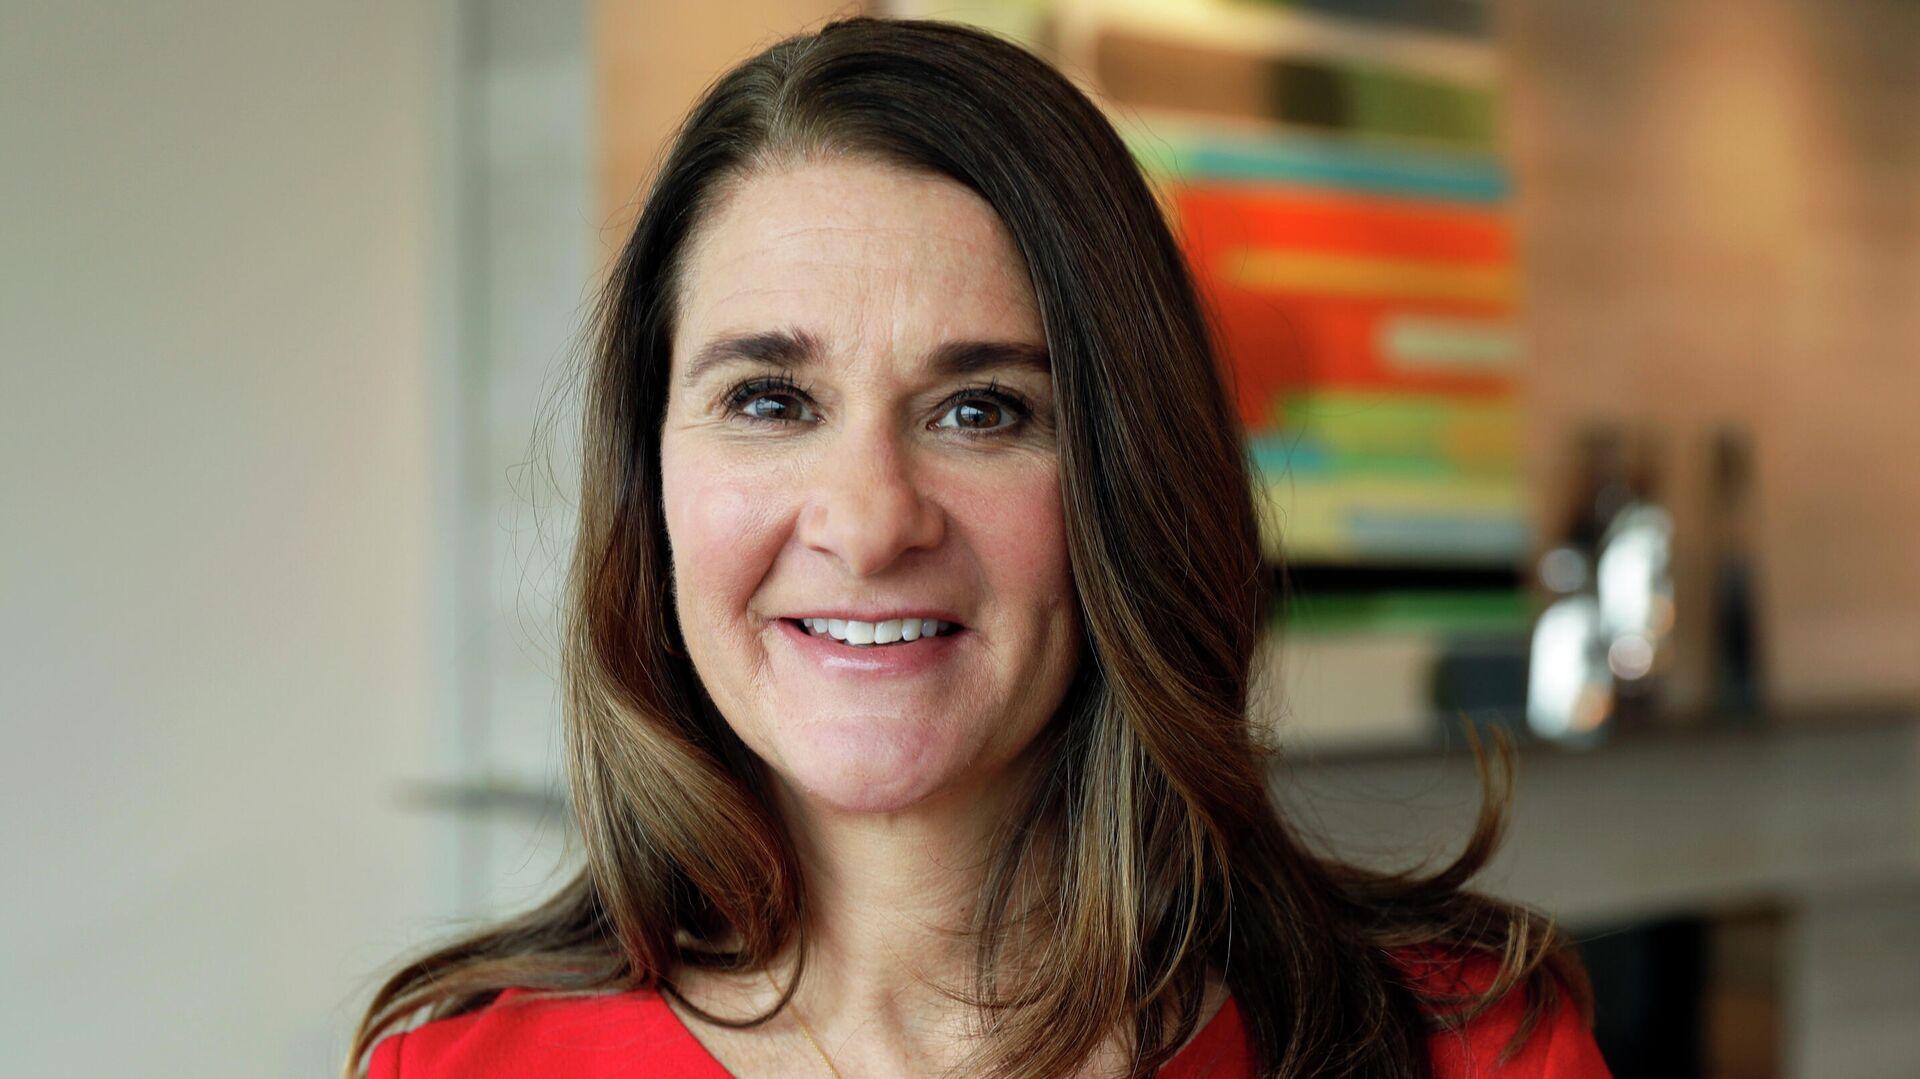 Melinda Gates, esposa de Bill Gates - Sputnik Mundo, 1920, 09.07.2021